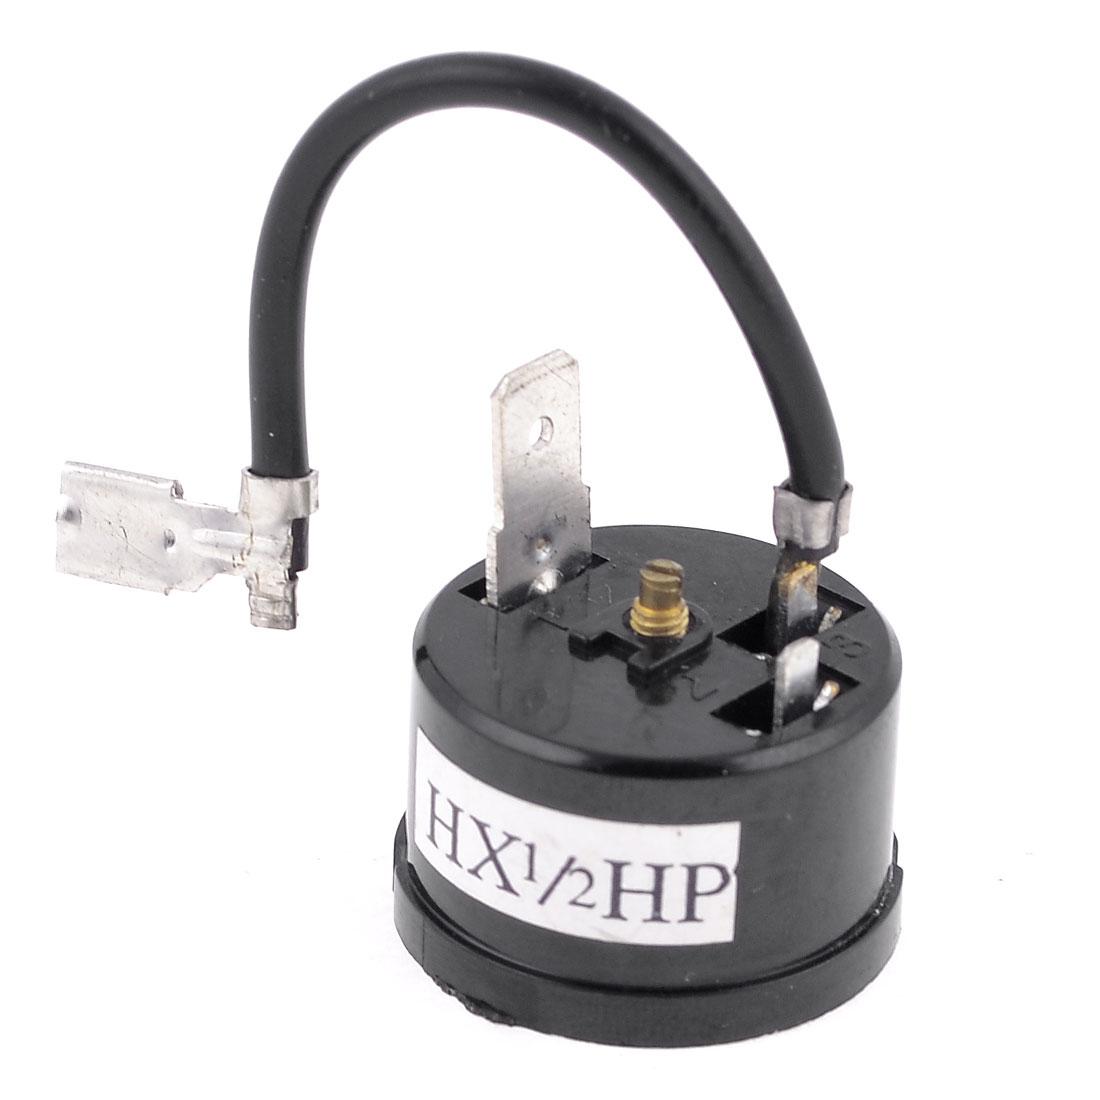 1/2HP Fridge Refrigerator Compressor Thermal Protector Black